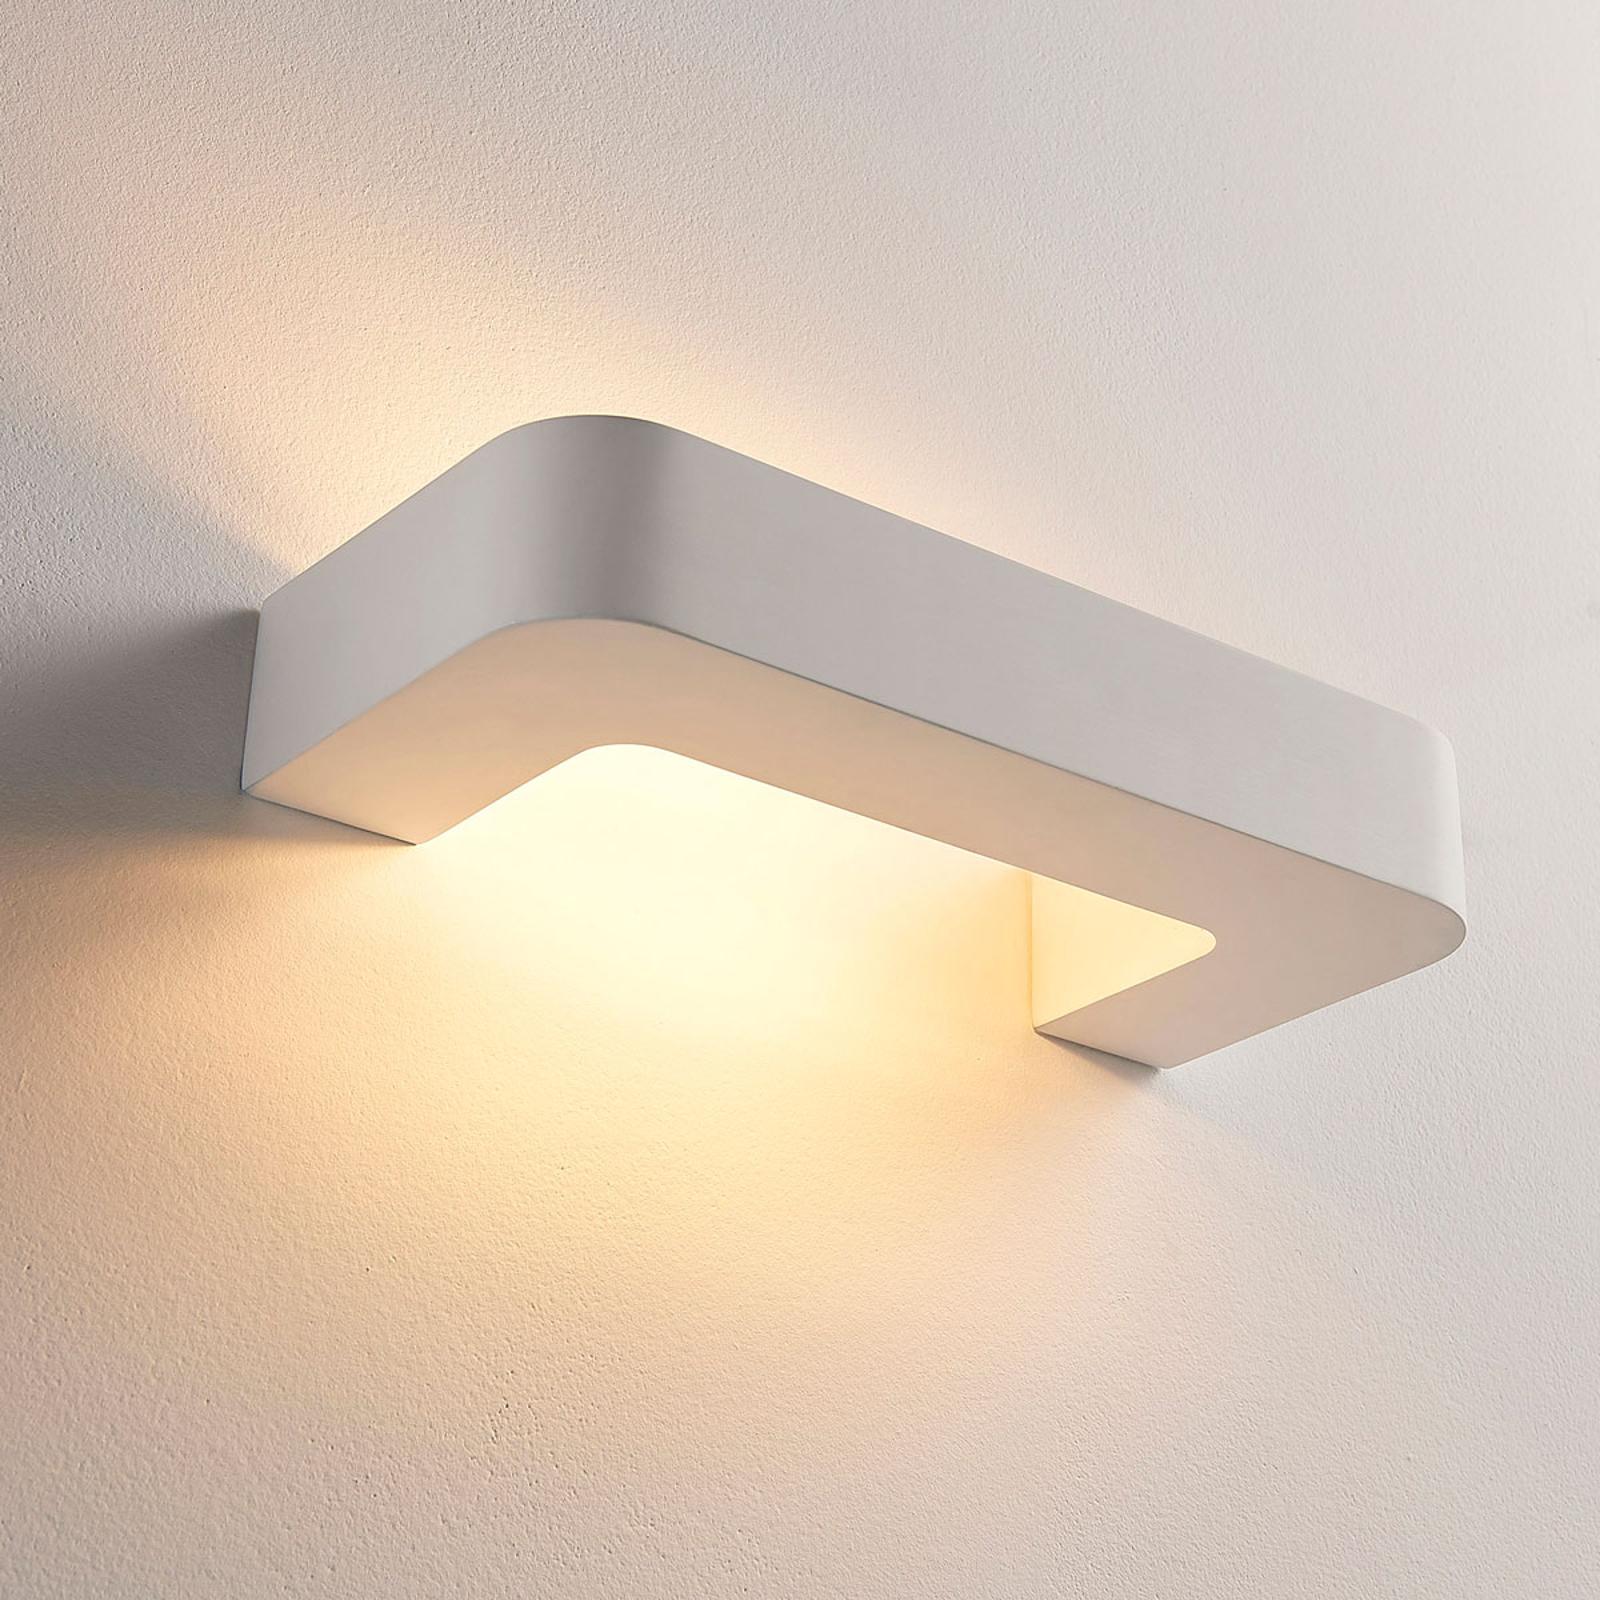 Bygelformad LED-vägglampa Julika, vitt gips